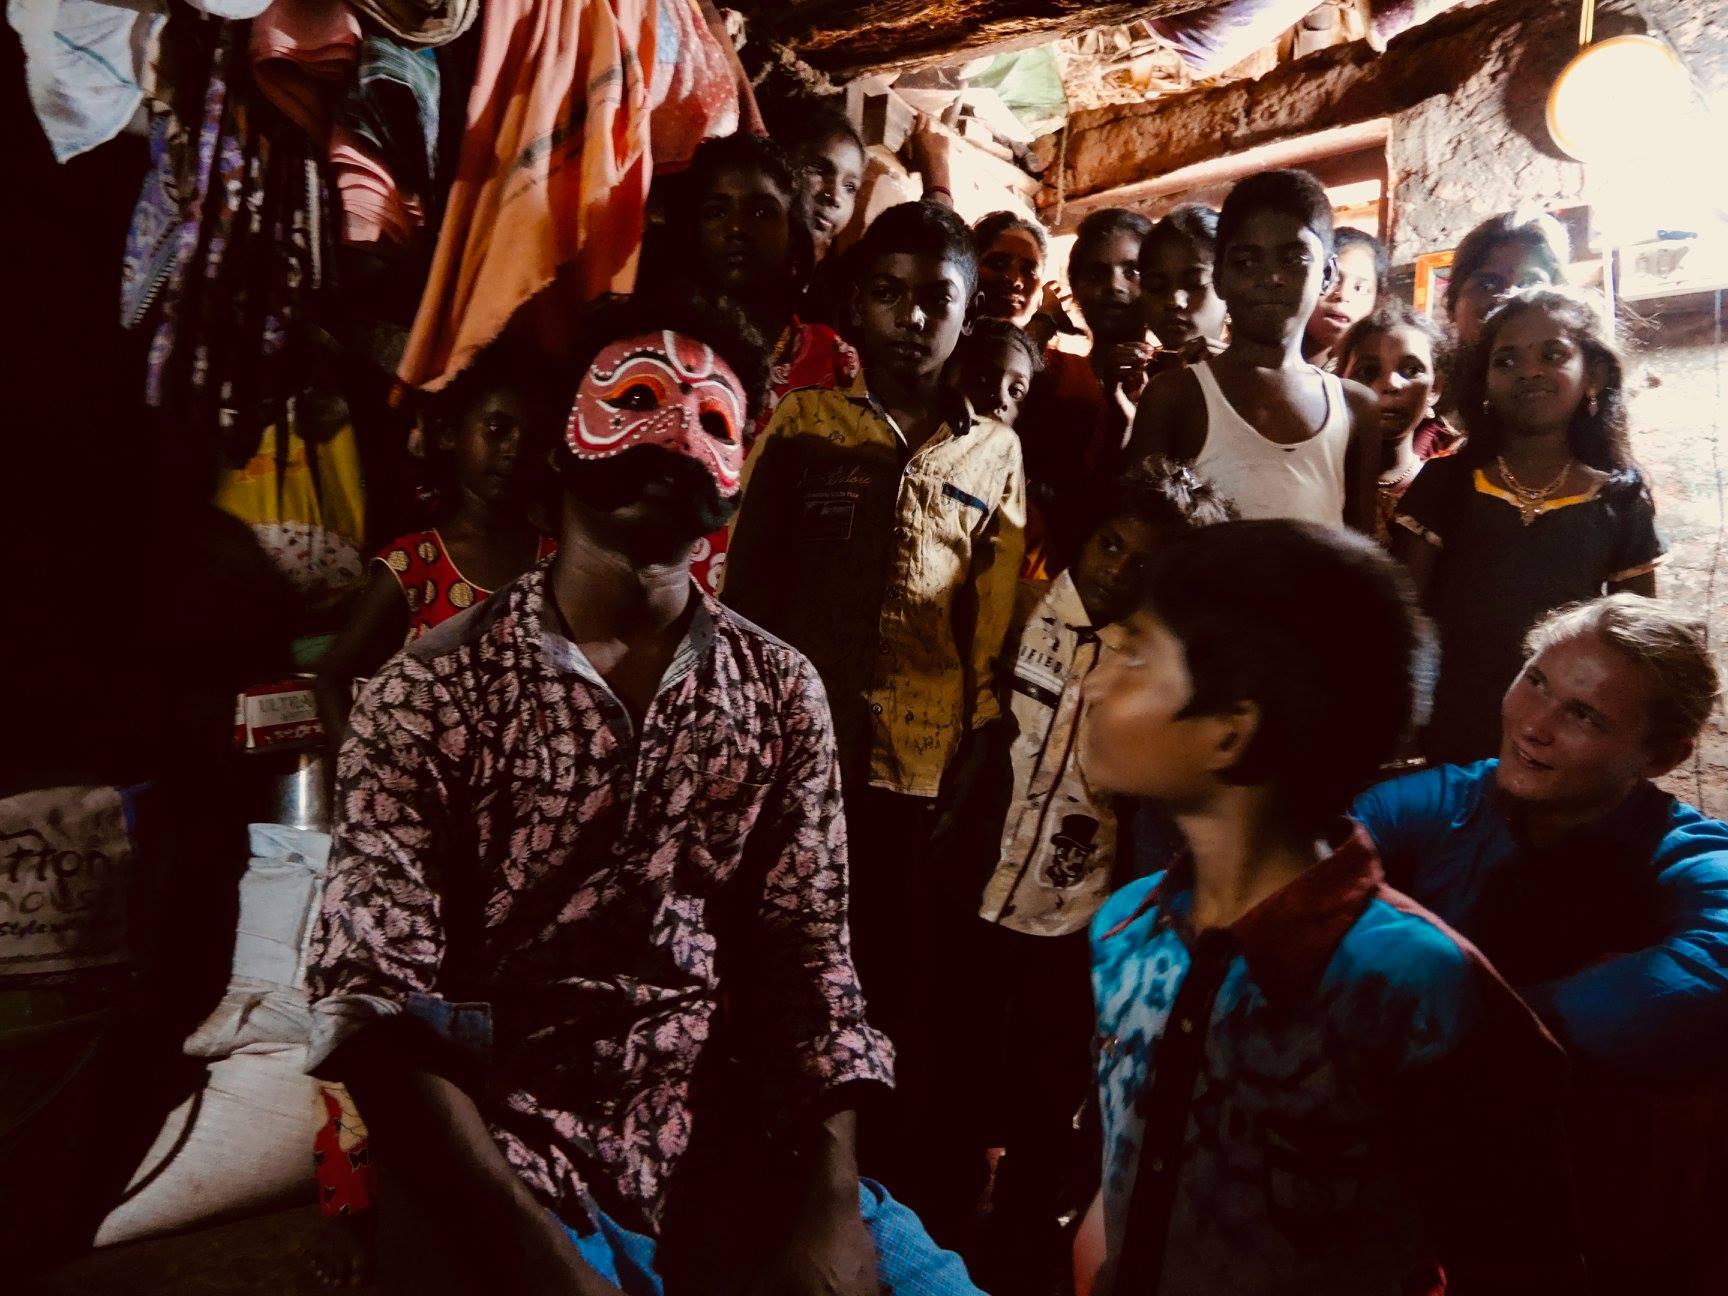 Over Diwali 2018 Karna visited the home of one of the students of the Kattaikkuttu Gurukulam.